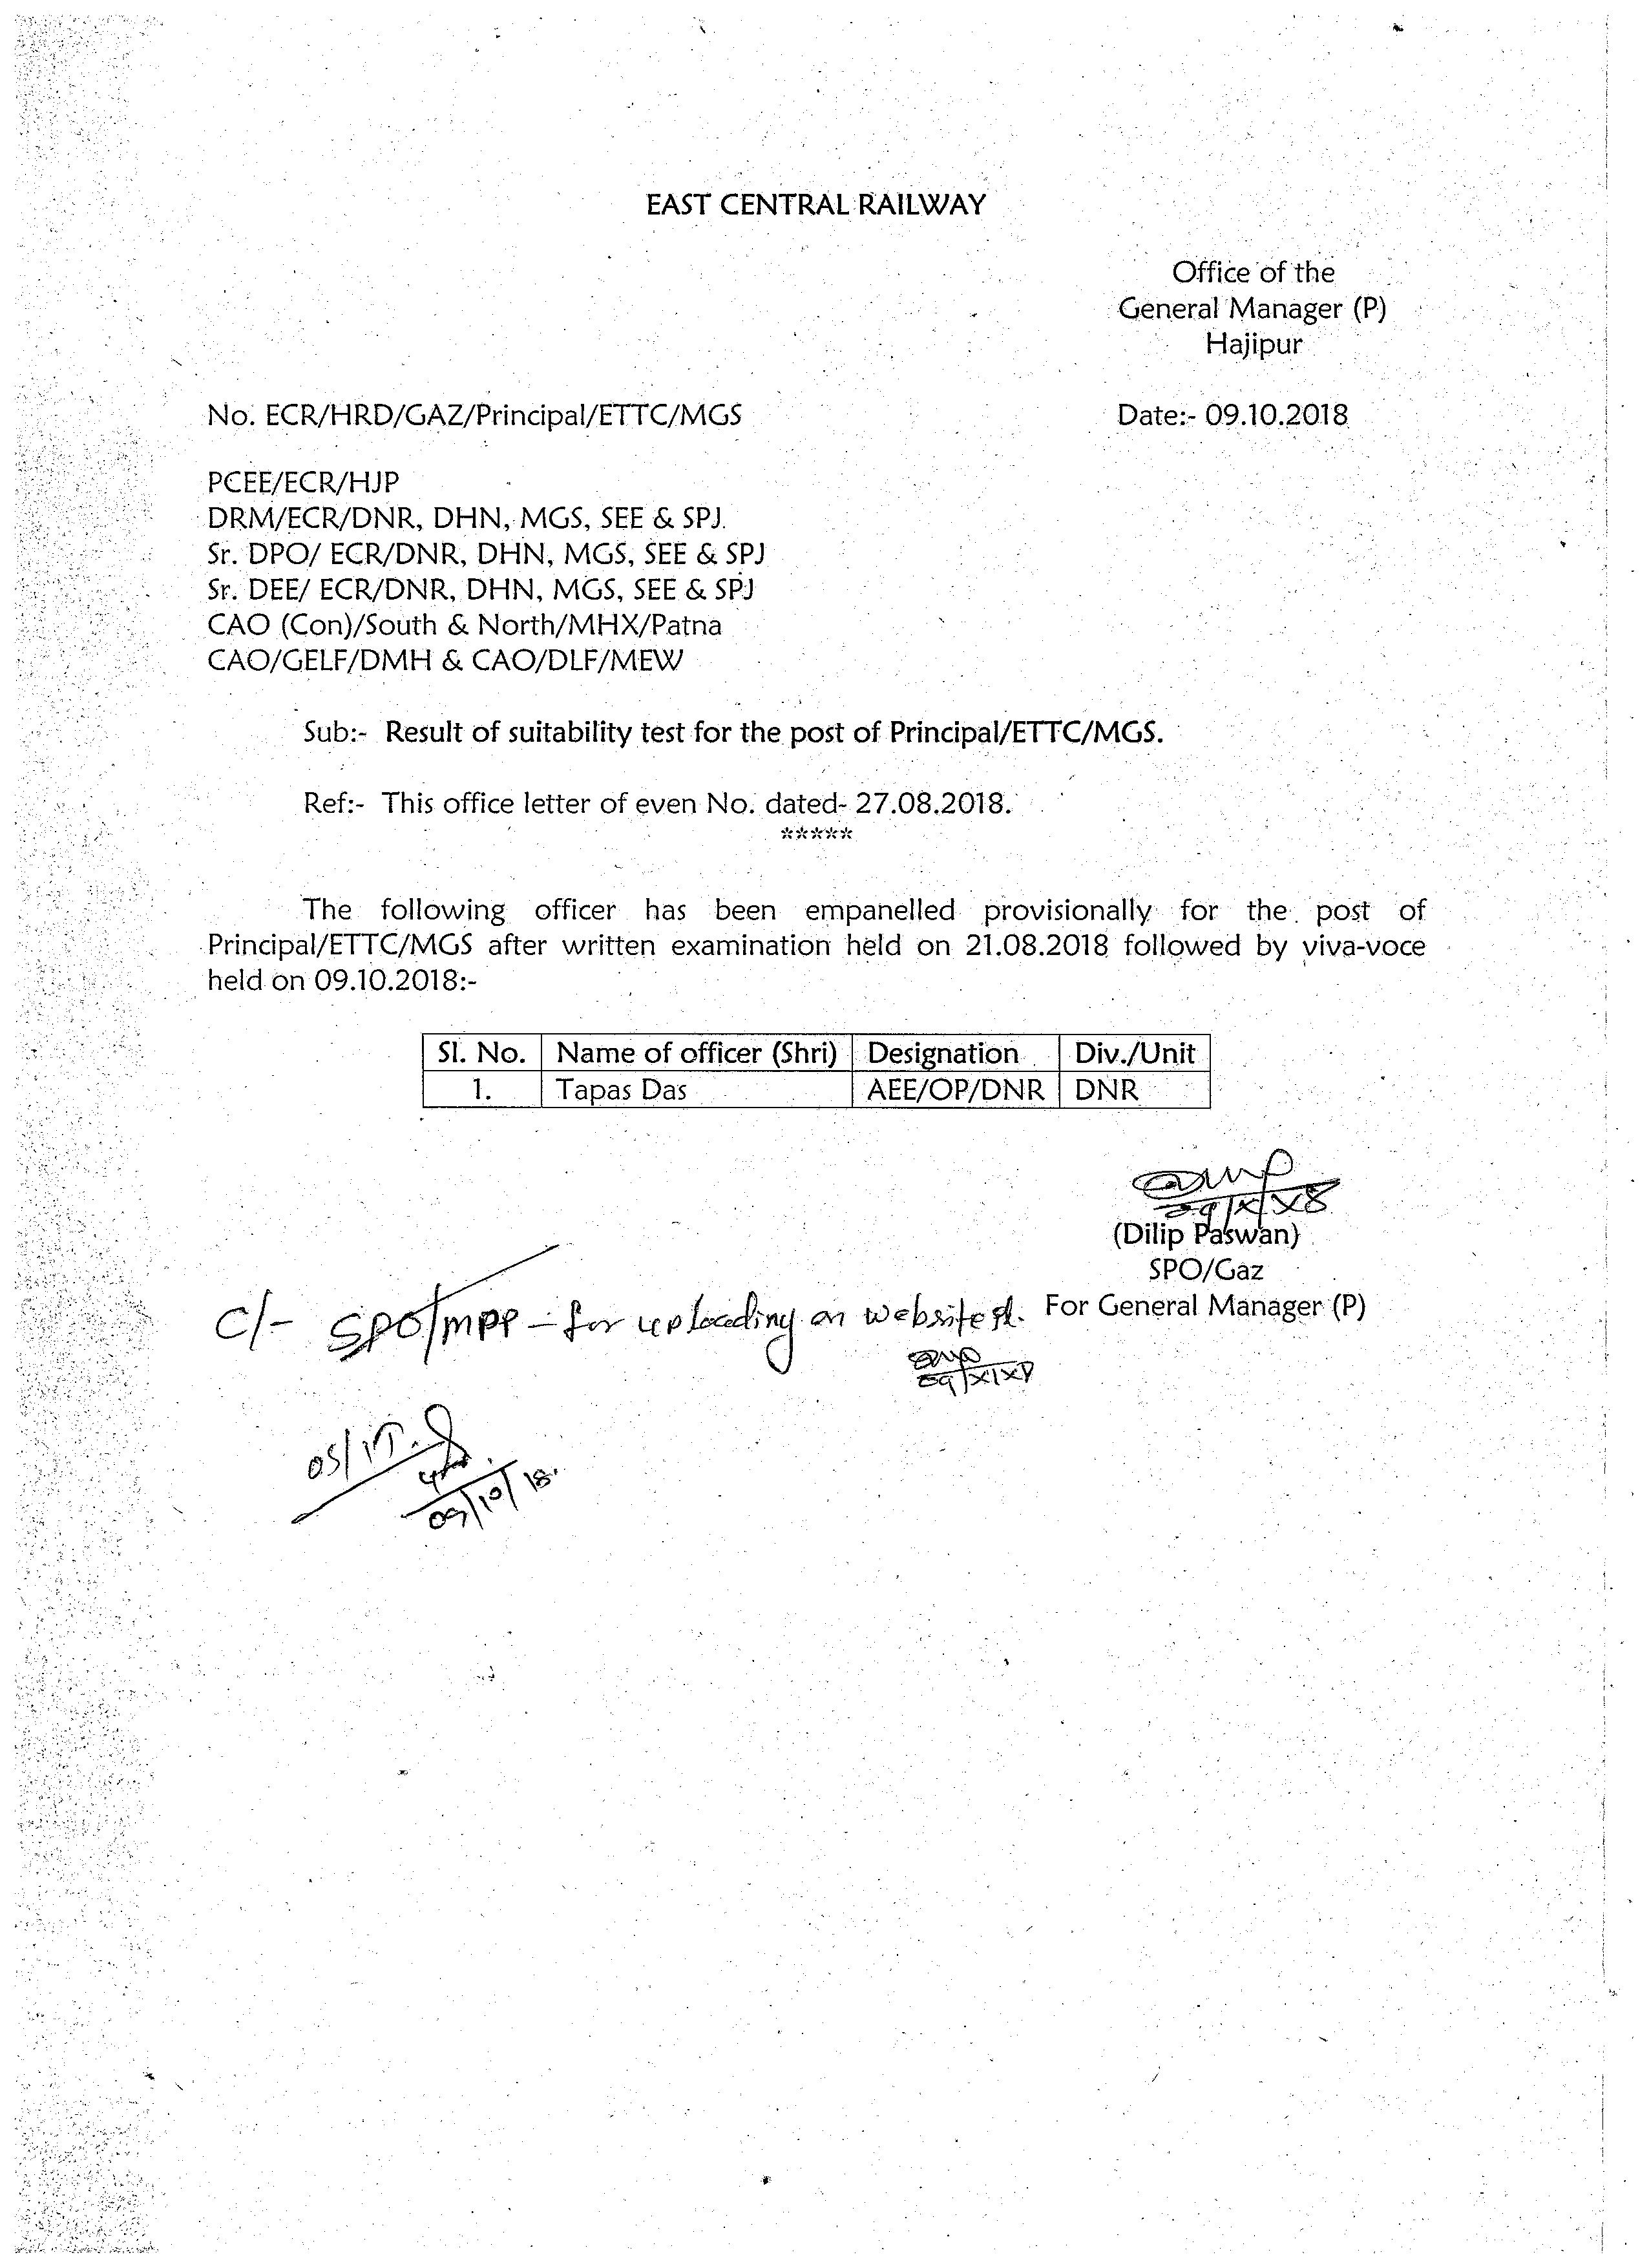 Railway recruitment 2018 - Indian railway jobs apply at www.rrb.gov ...